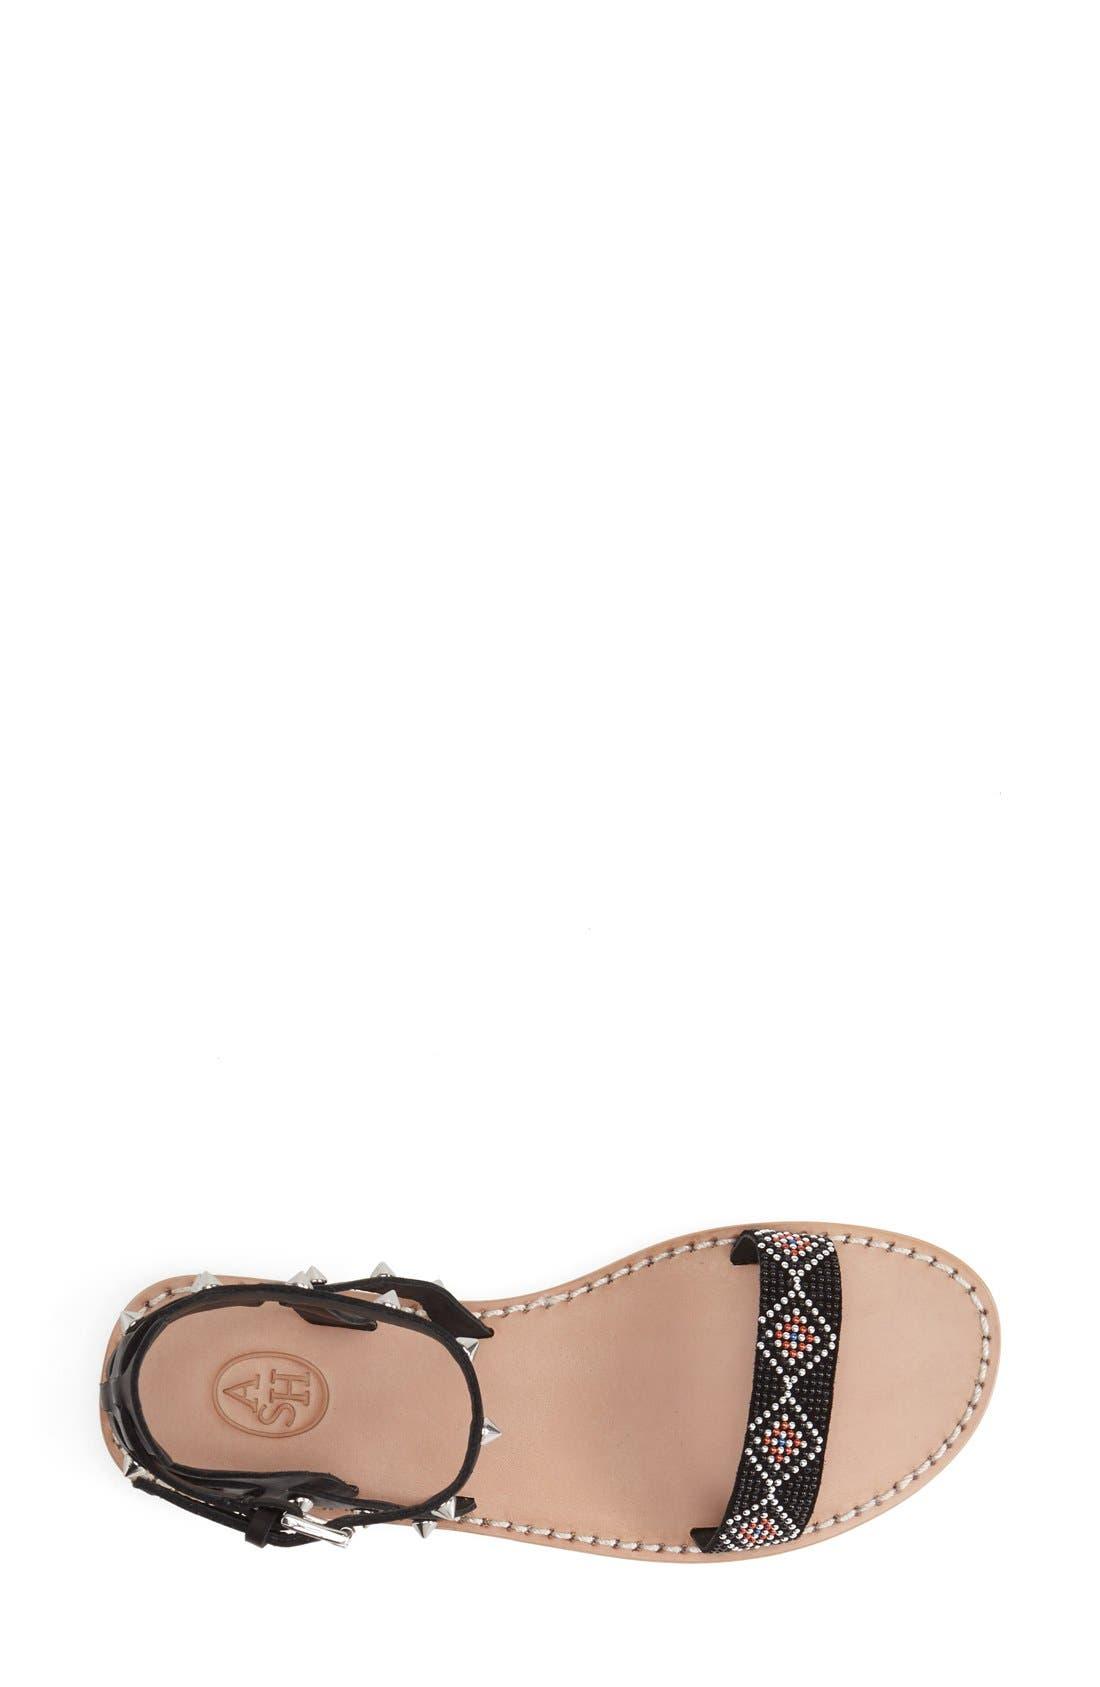 'Pearl' Studded Leather Sandal,                             Alternate thumbnail 3, color,                             001